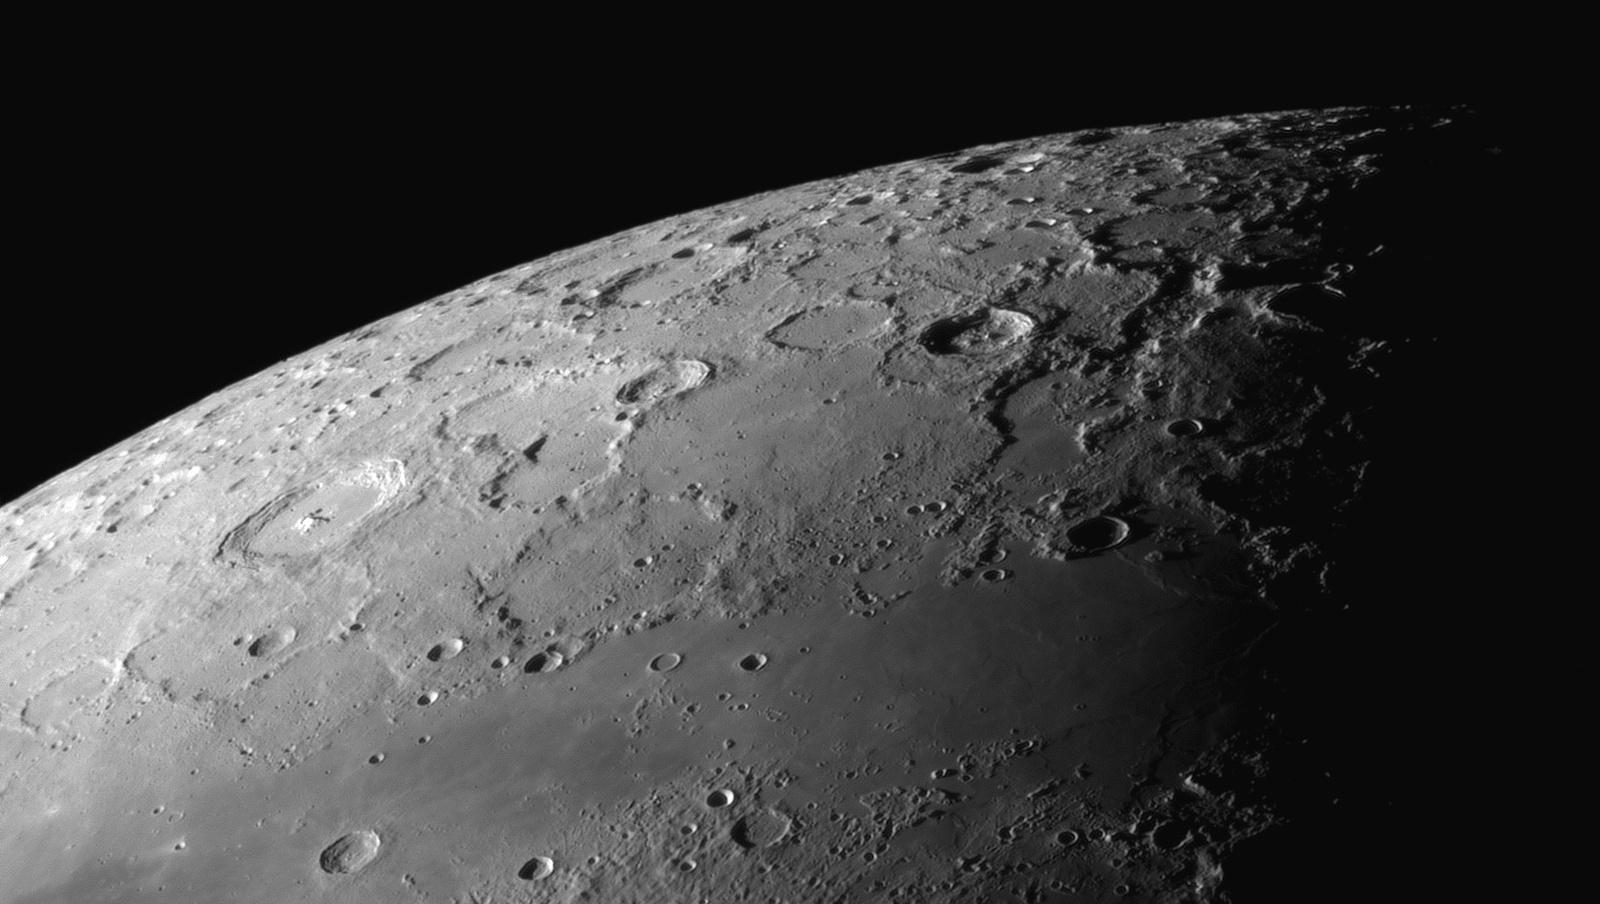 Północny biegun, Pythagoras, Philolaus_24.08.2019r_TS152F2270_ASI290MM_Halpha 35nm_105%....jpg